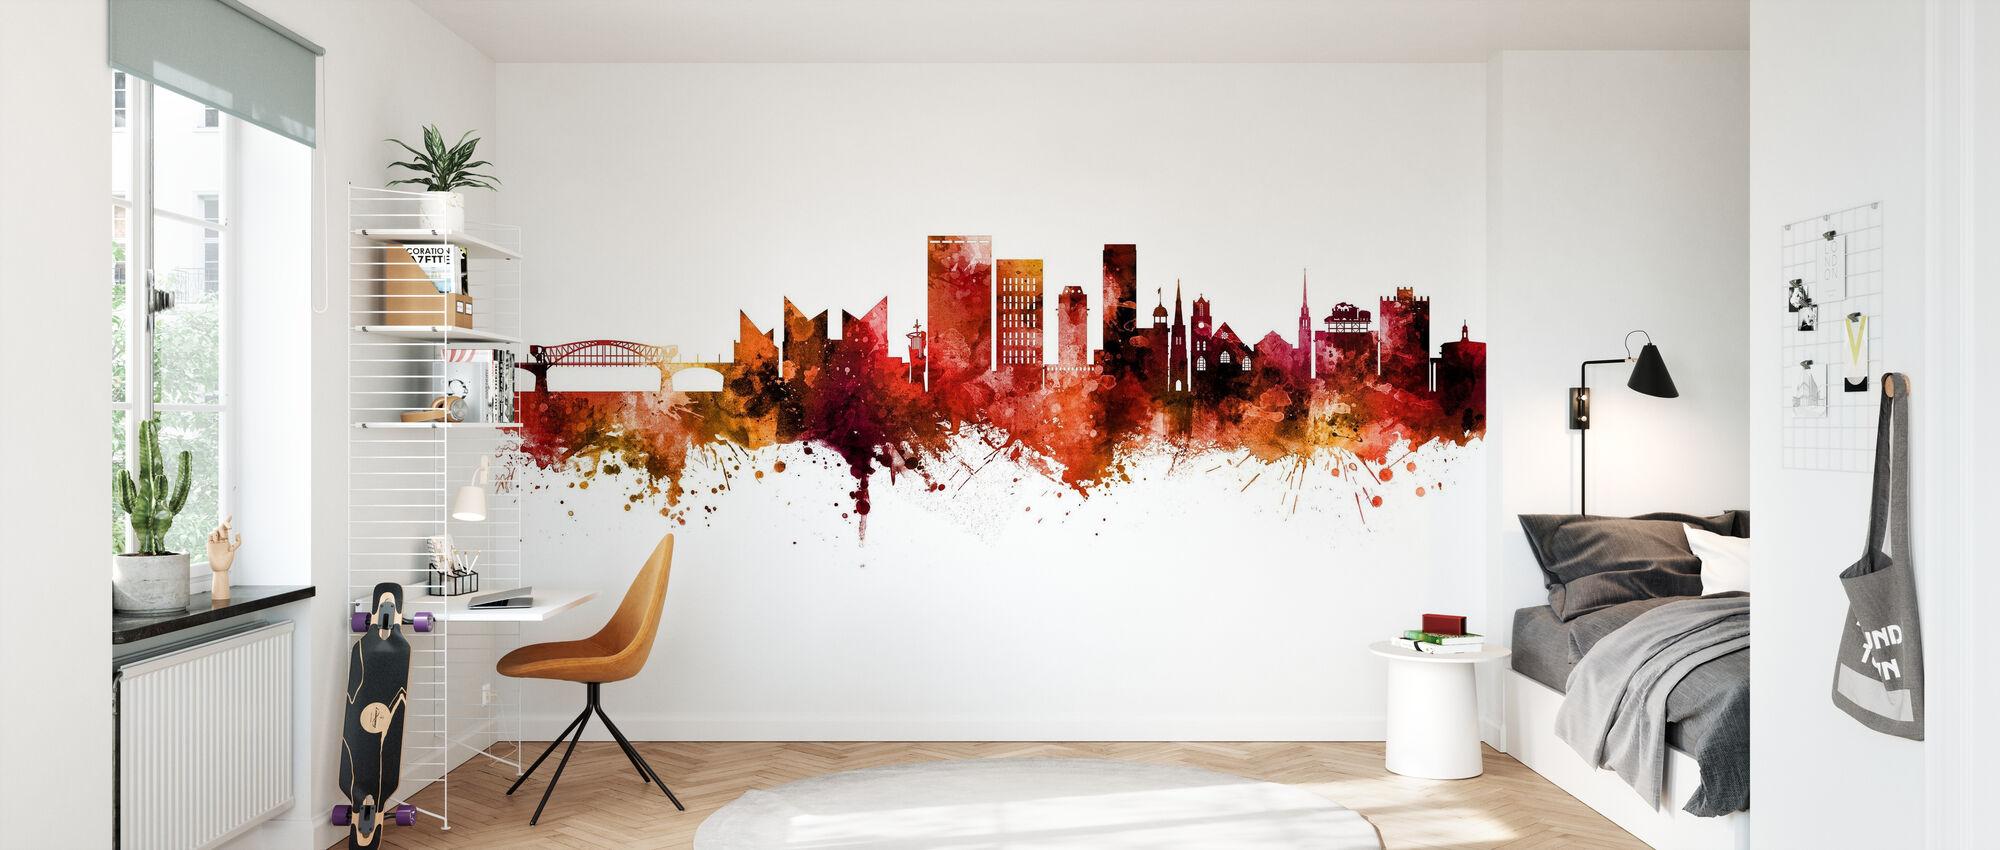 Chattanooga Tennessee Skyline - Wallpaper - Kids Room